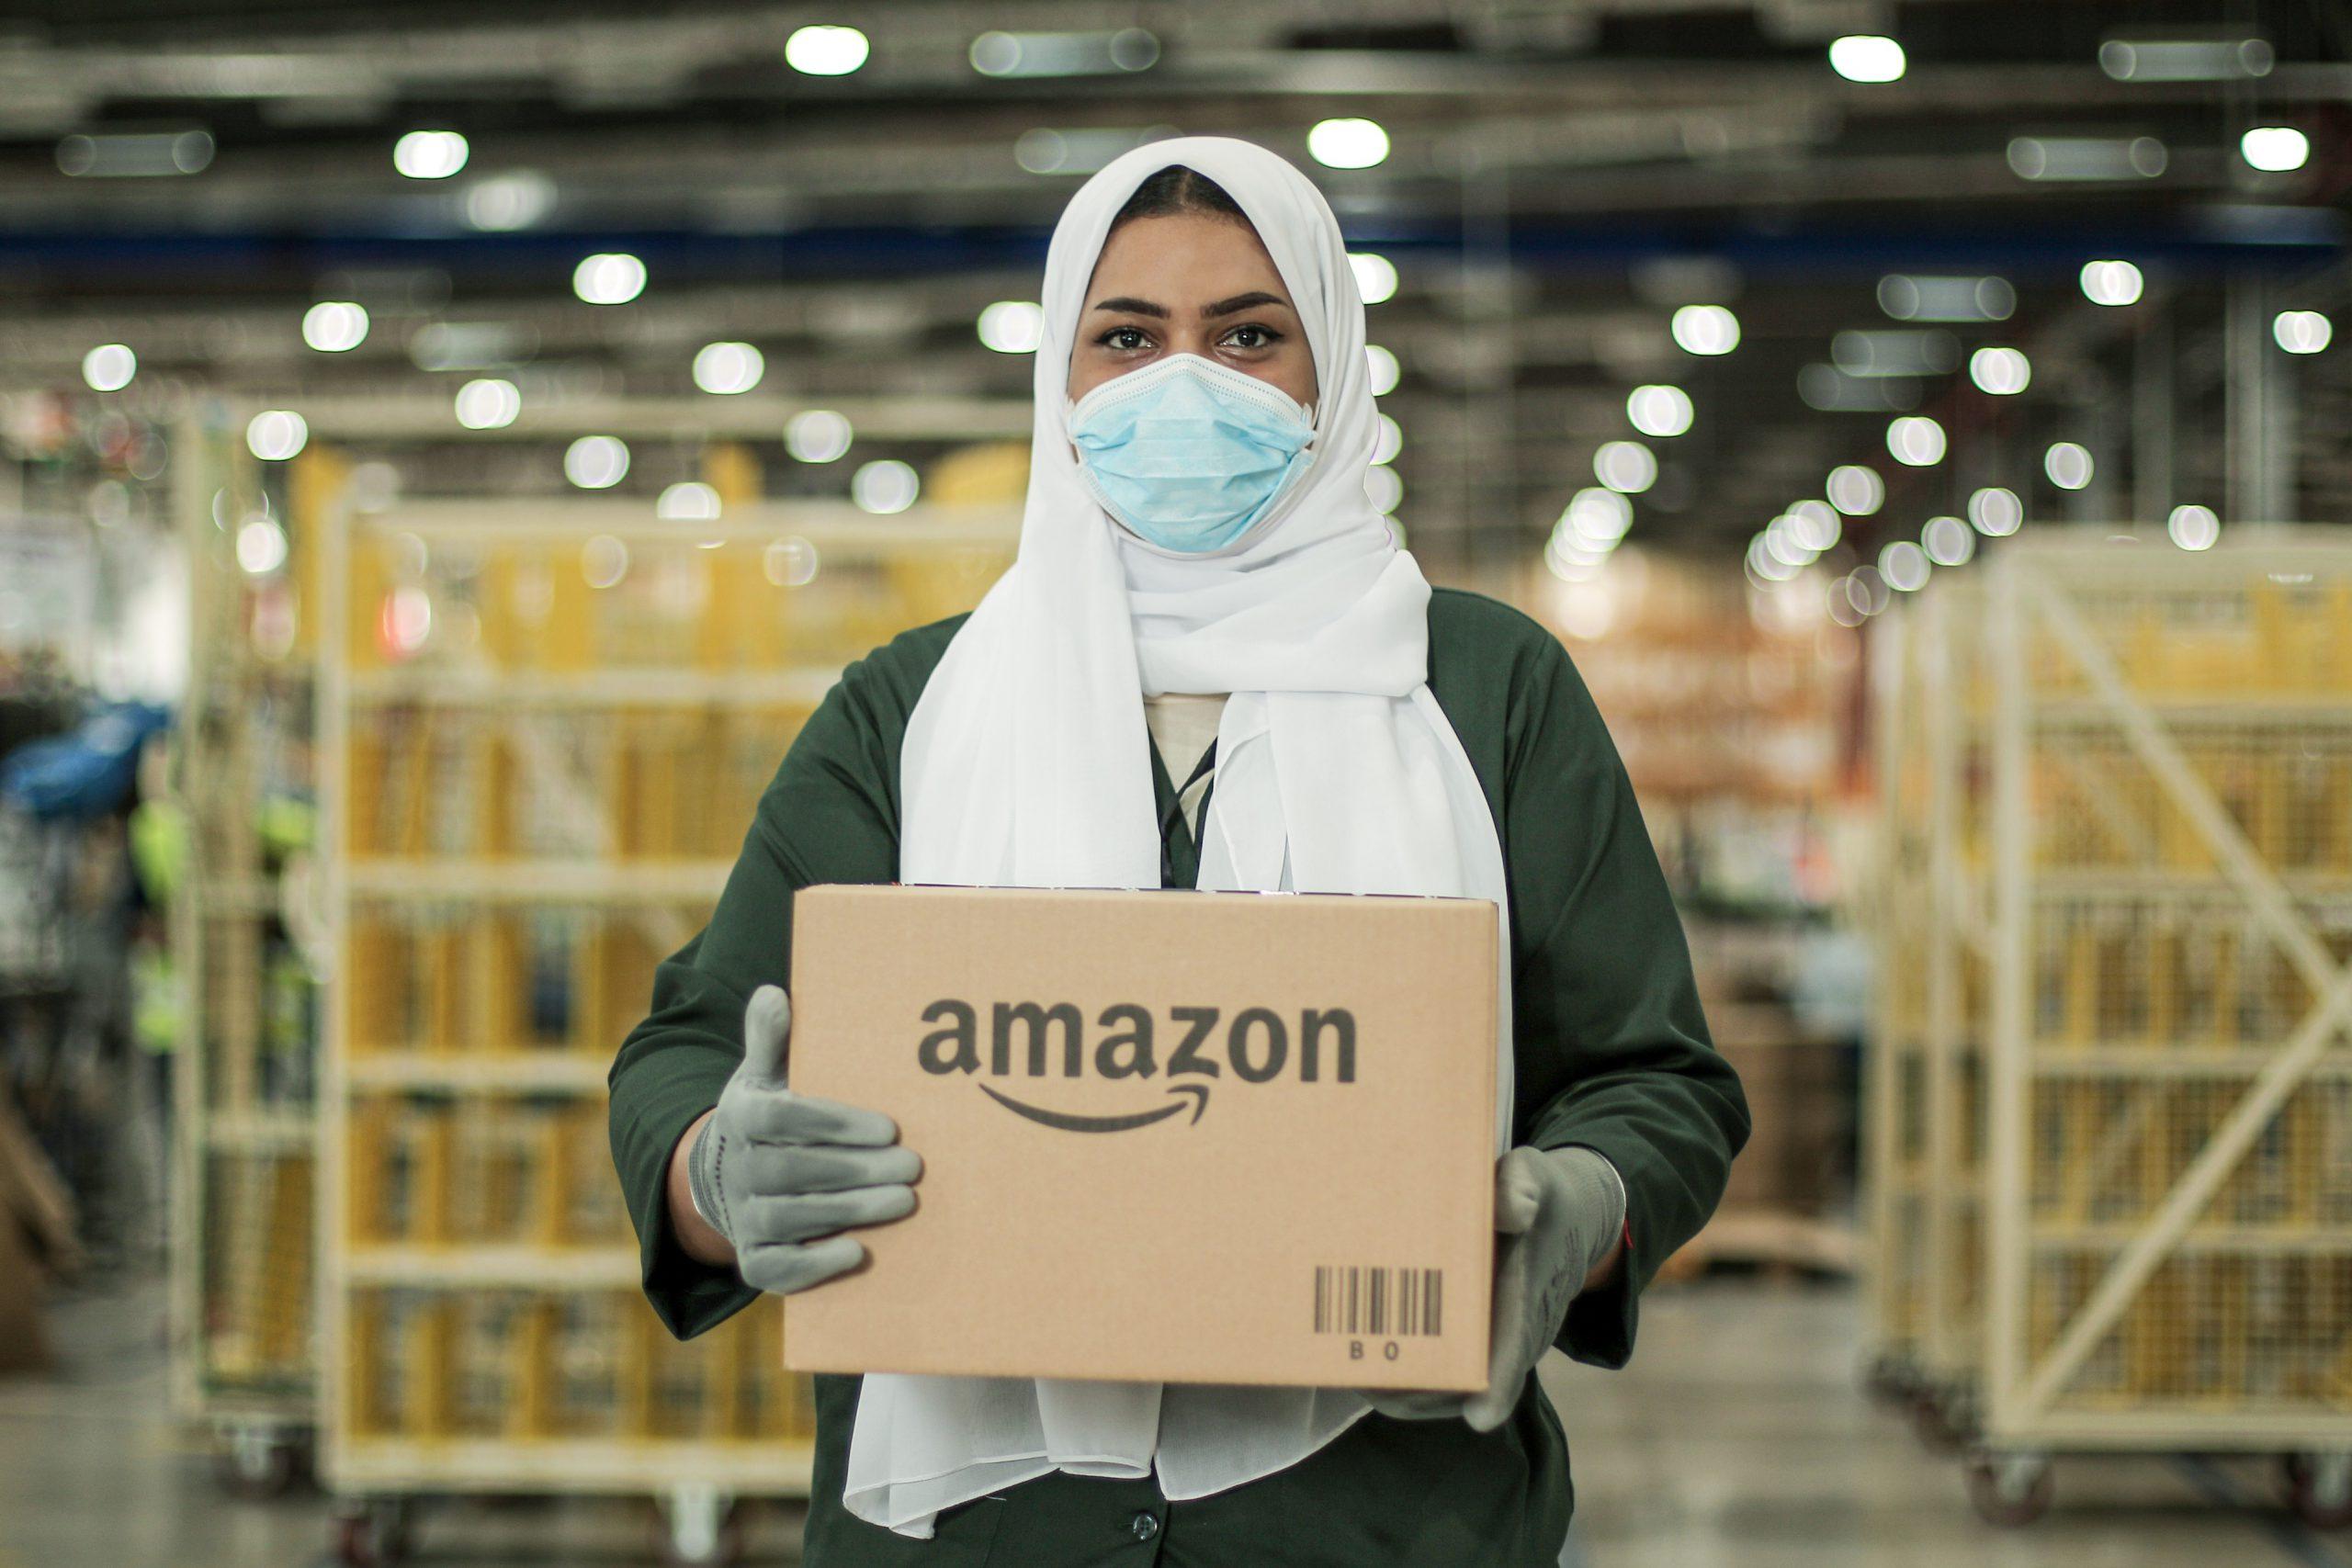 Amazon KSA Voucher Code